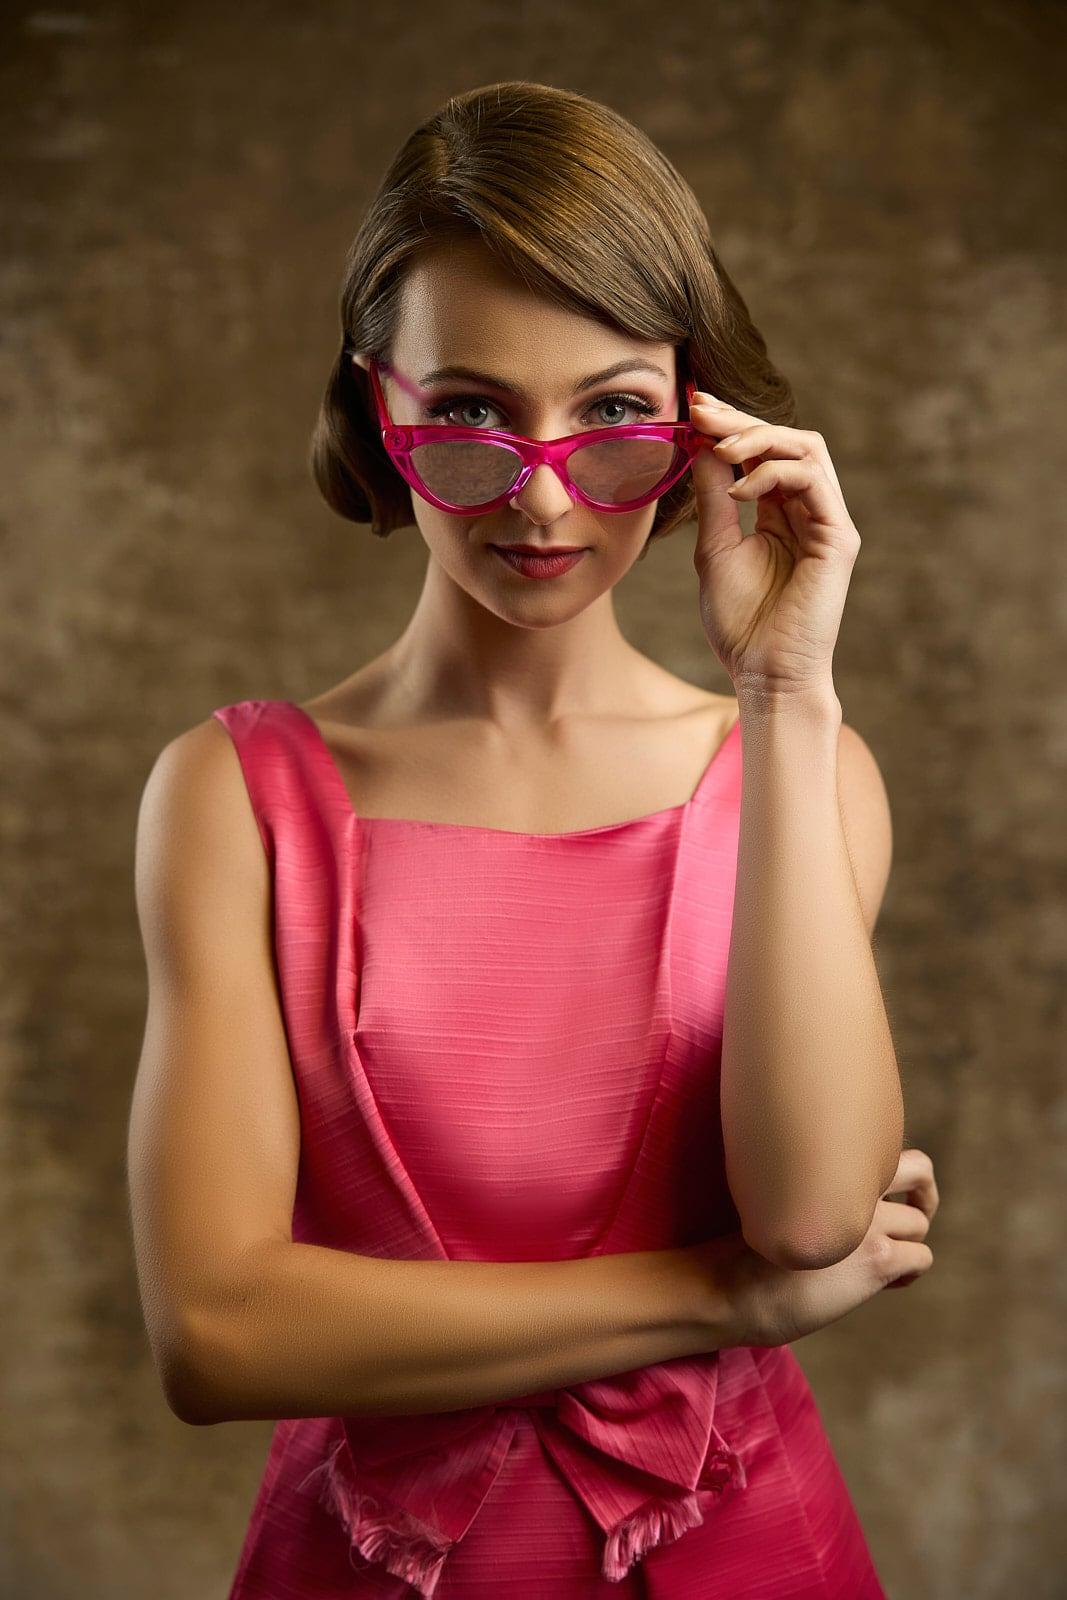 1950s pink dress and sunglasses portrait Atlanta photographer Mike Glatzer